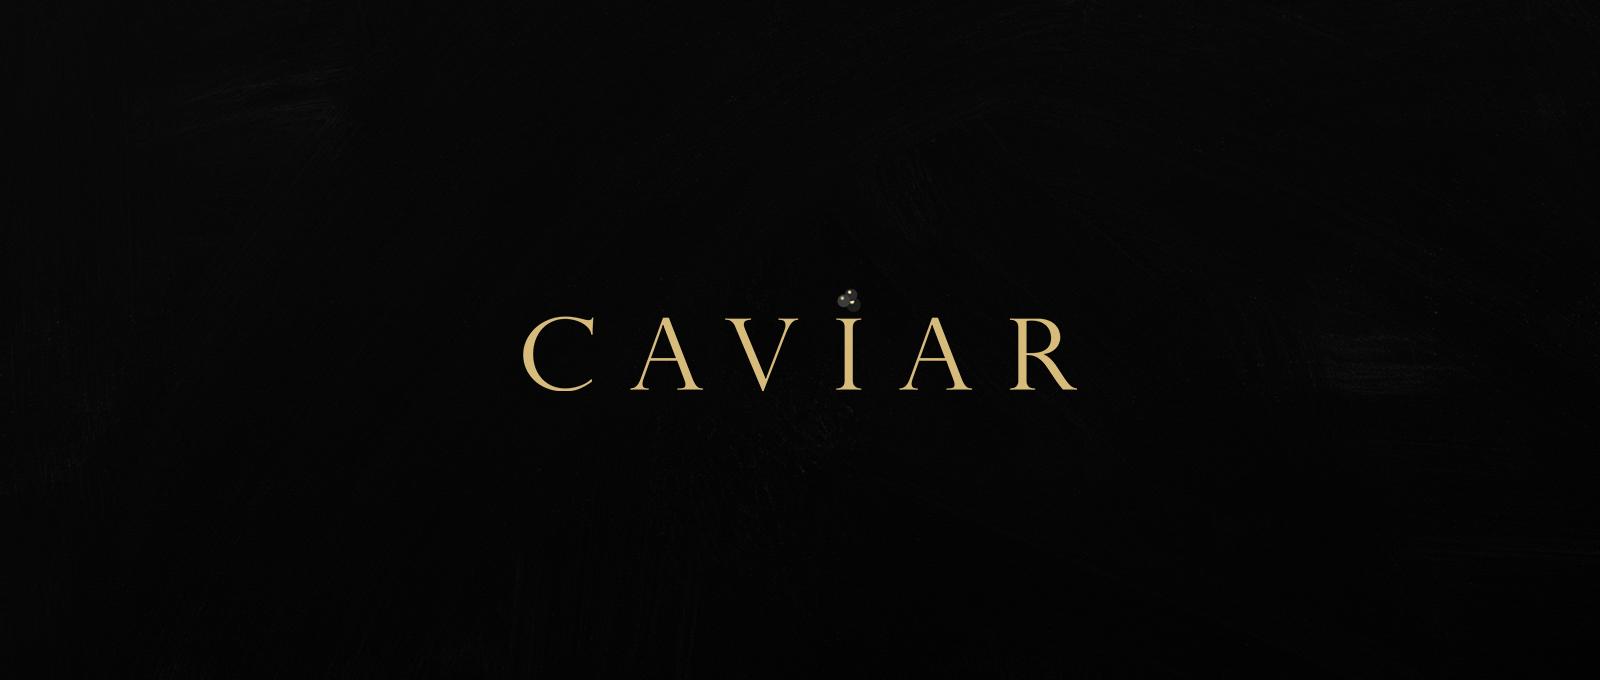 Over Caviar Fashion